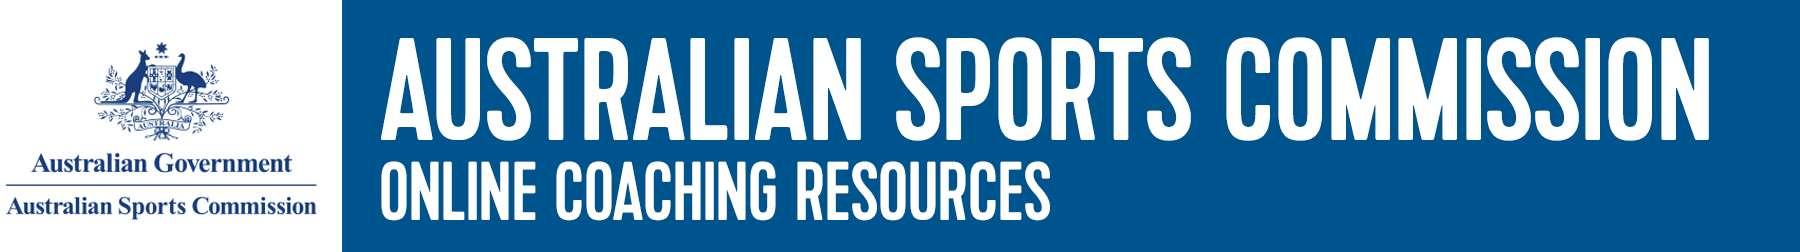 Aus Sports Commission Resources